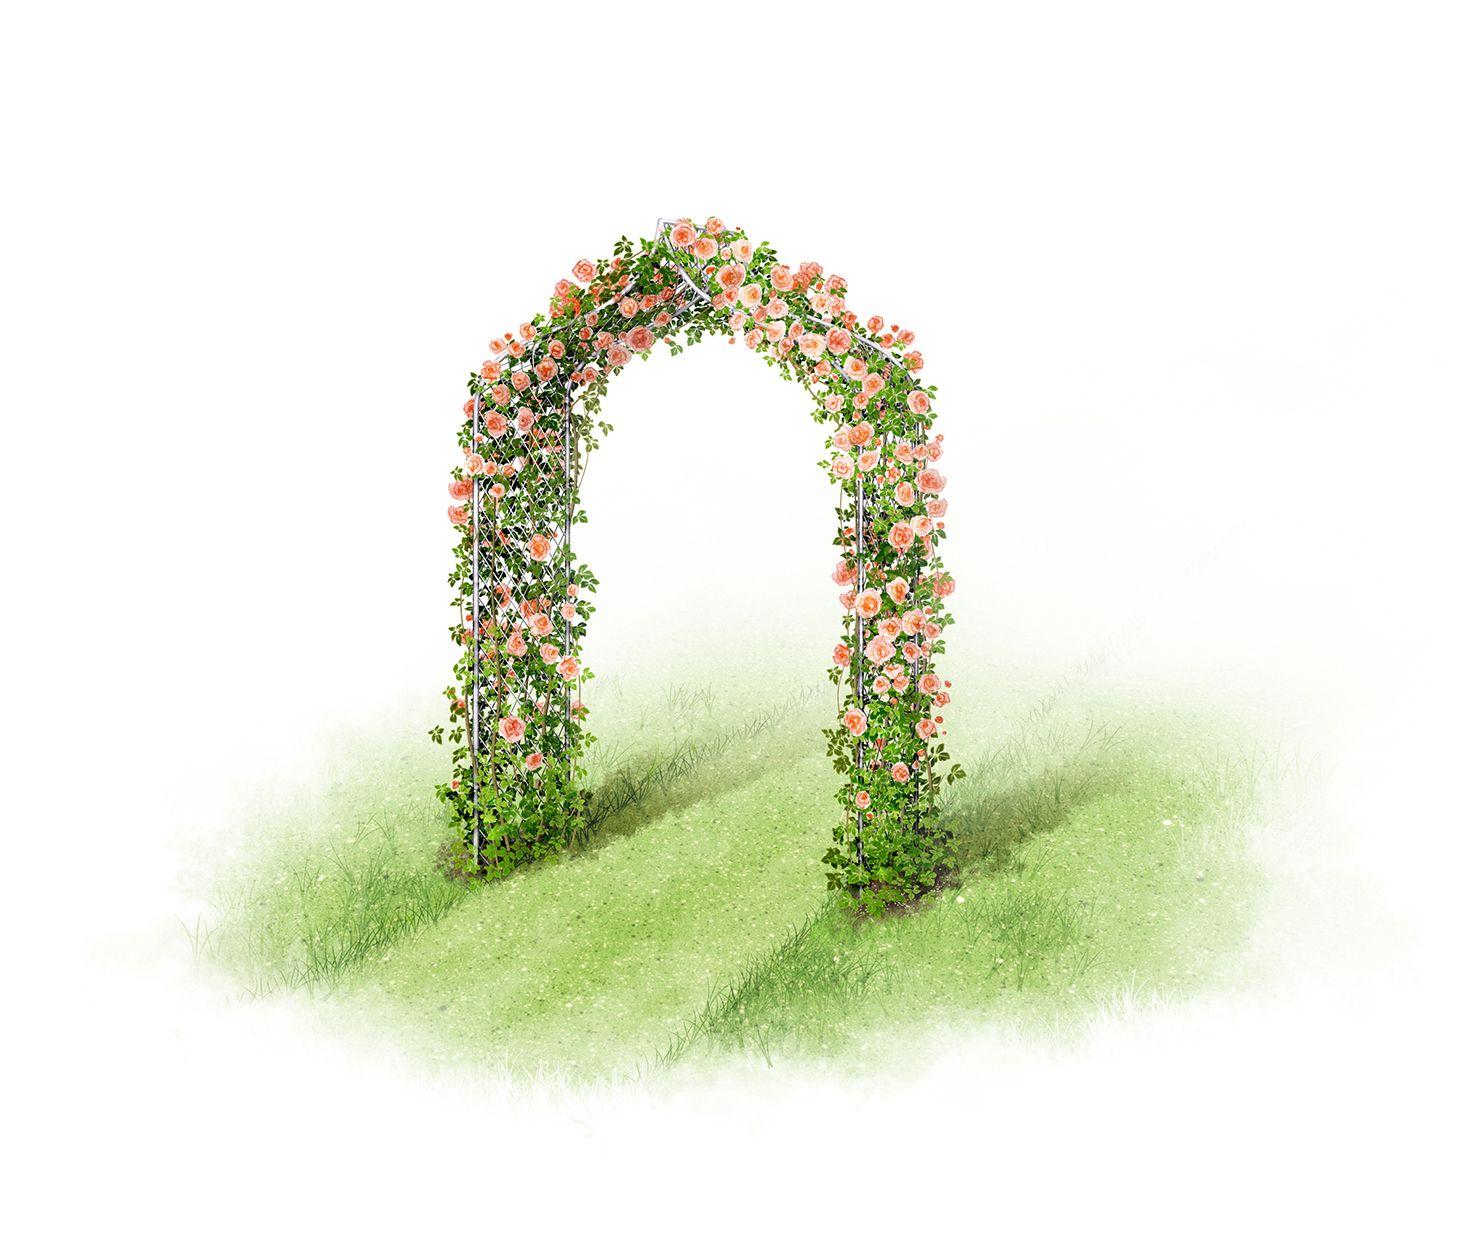 Garden arch illustrations - decorative metal arch